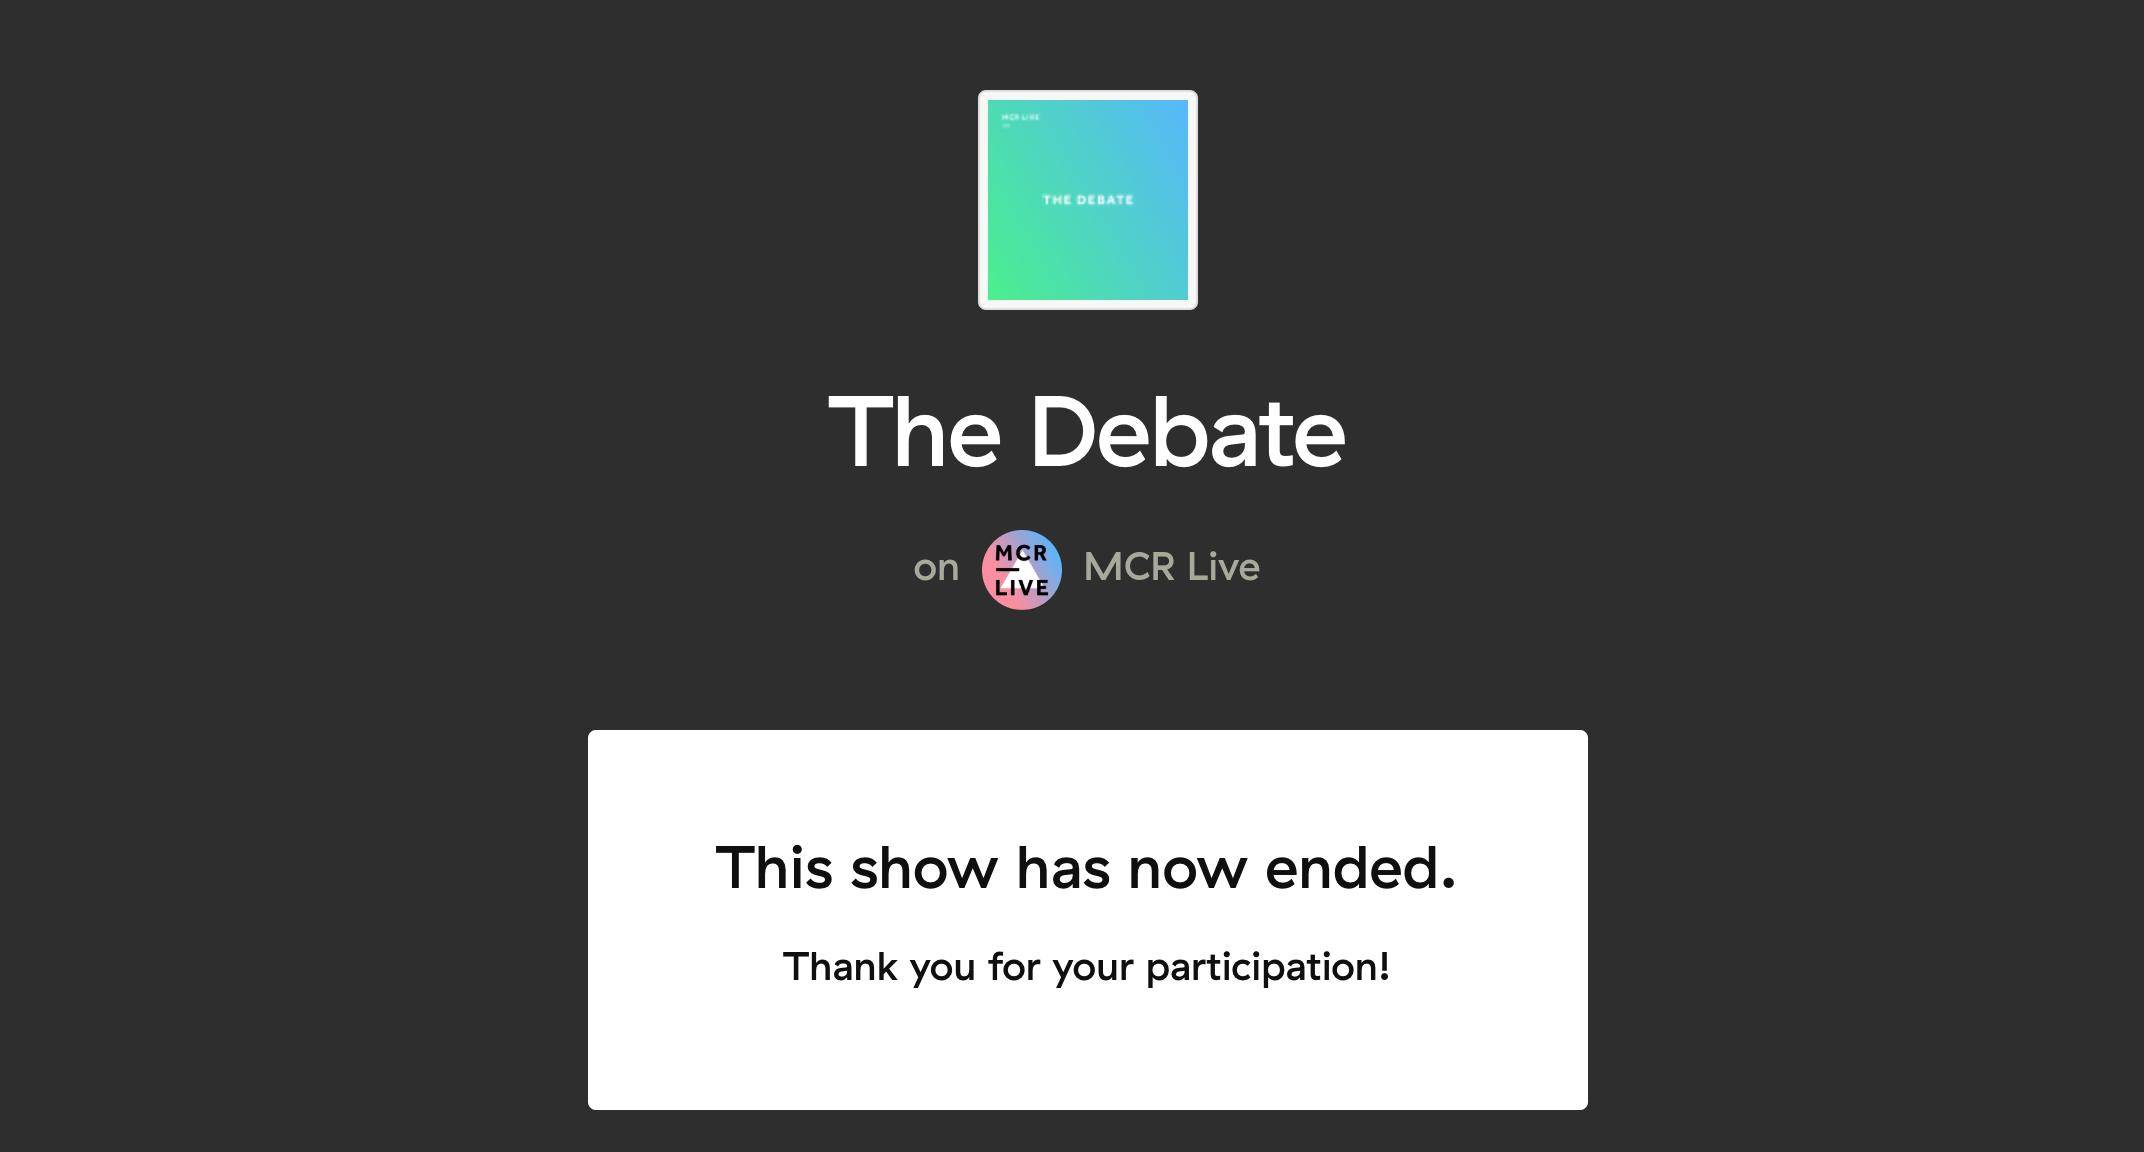 Talk show caller screen